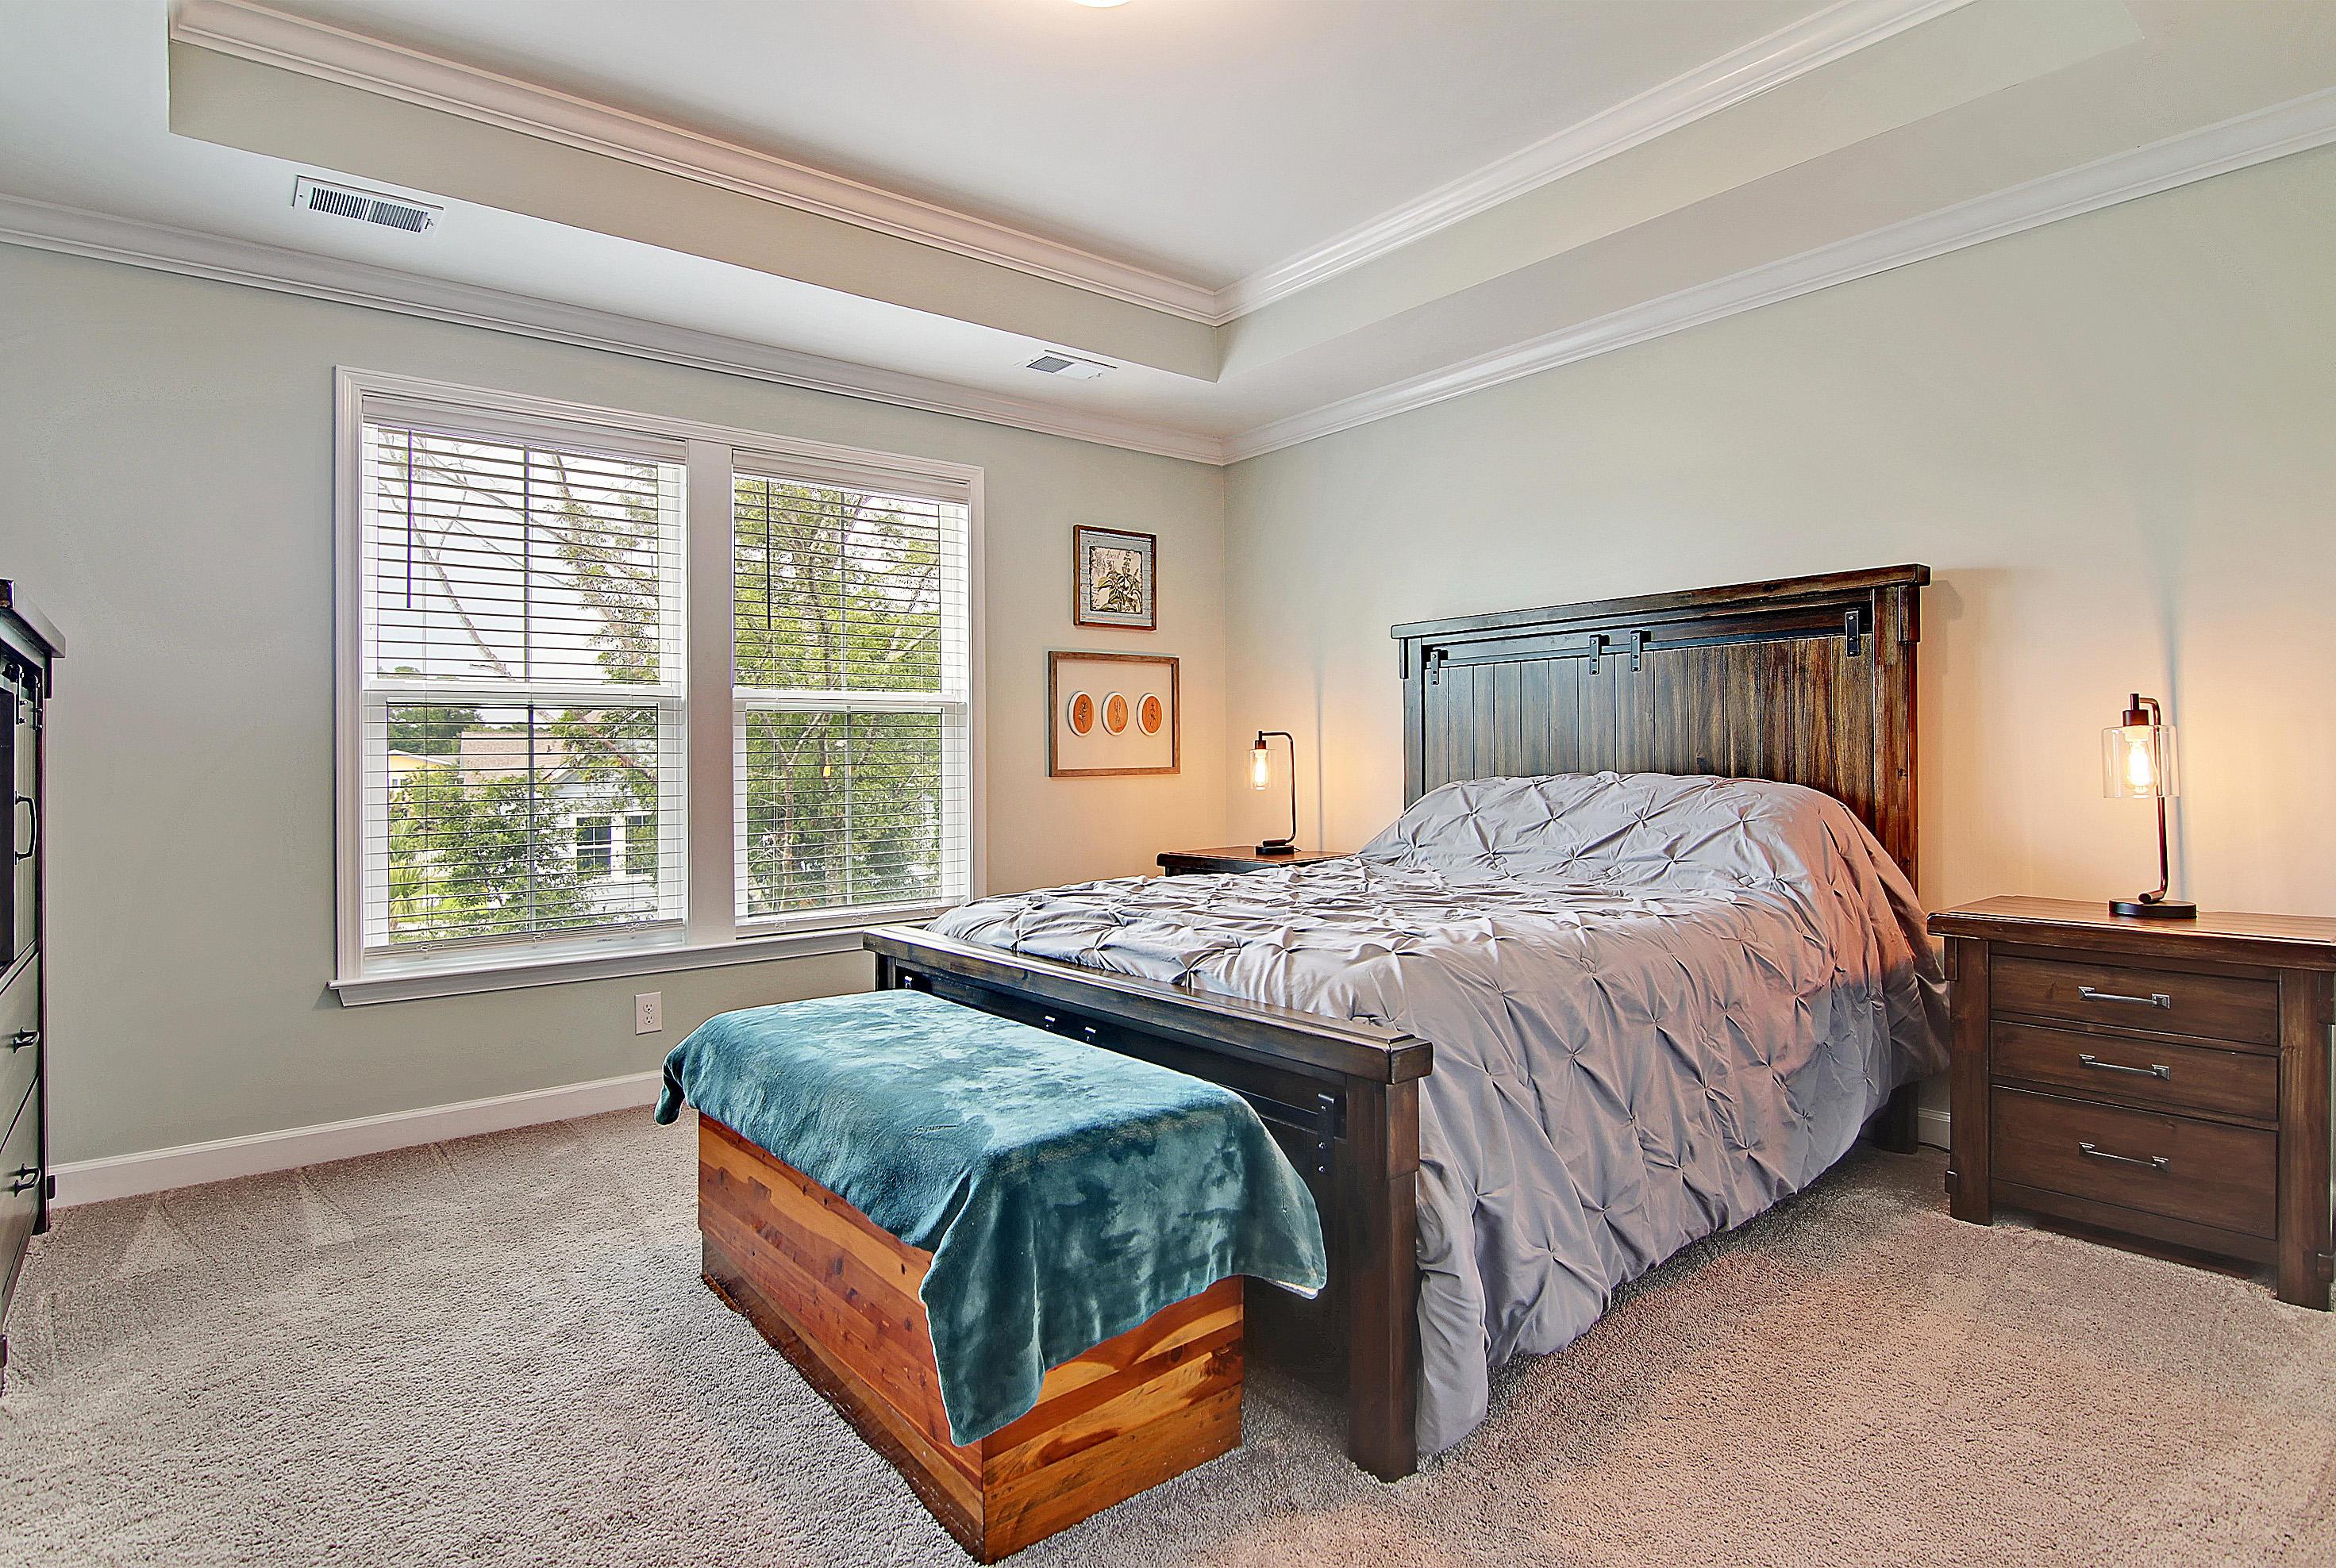 Park West Homes For Sale - 1551 Moss Spring, Mount Pleasant, SC - 45